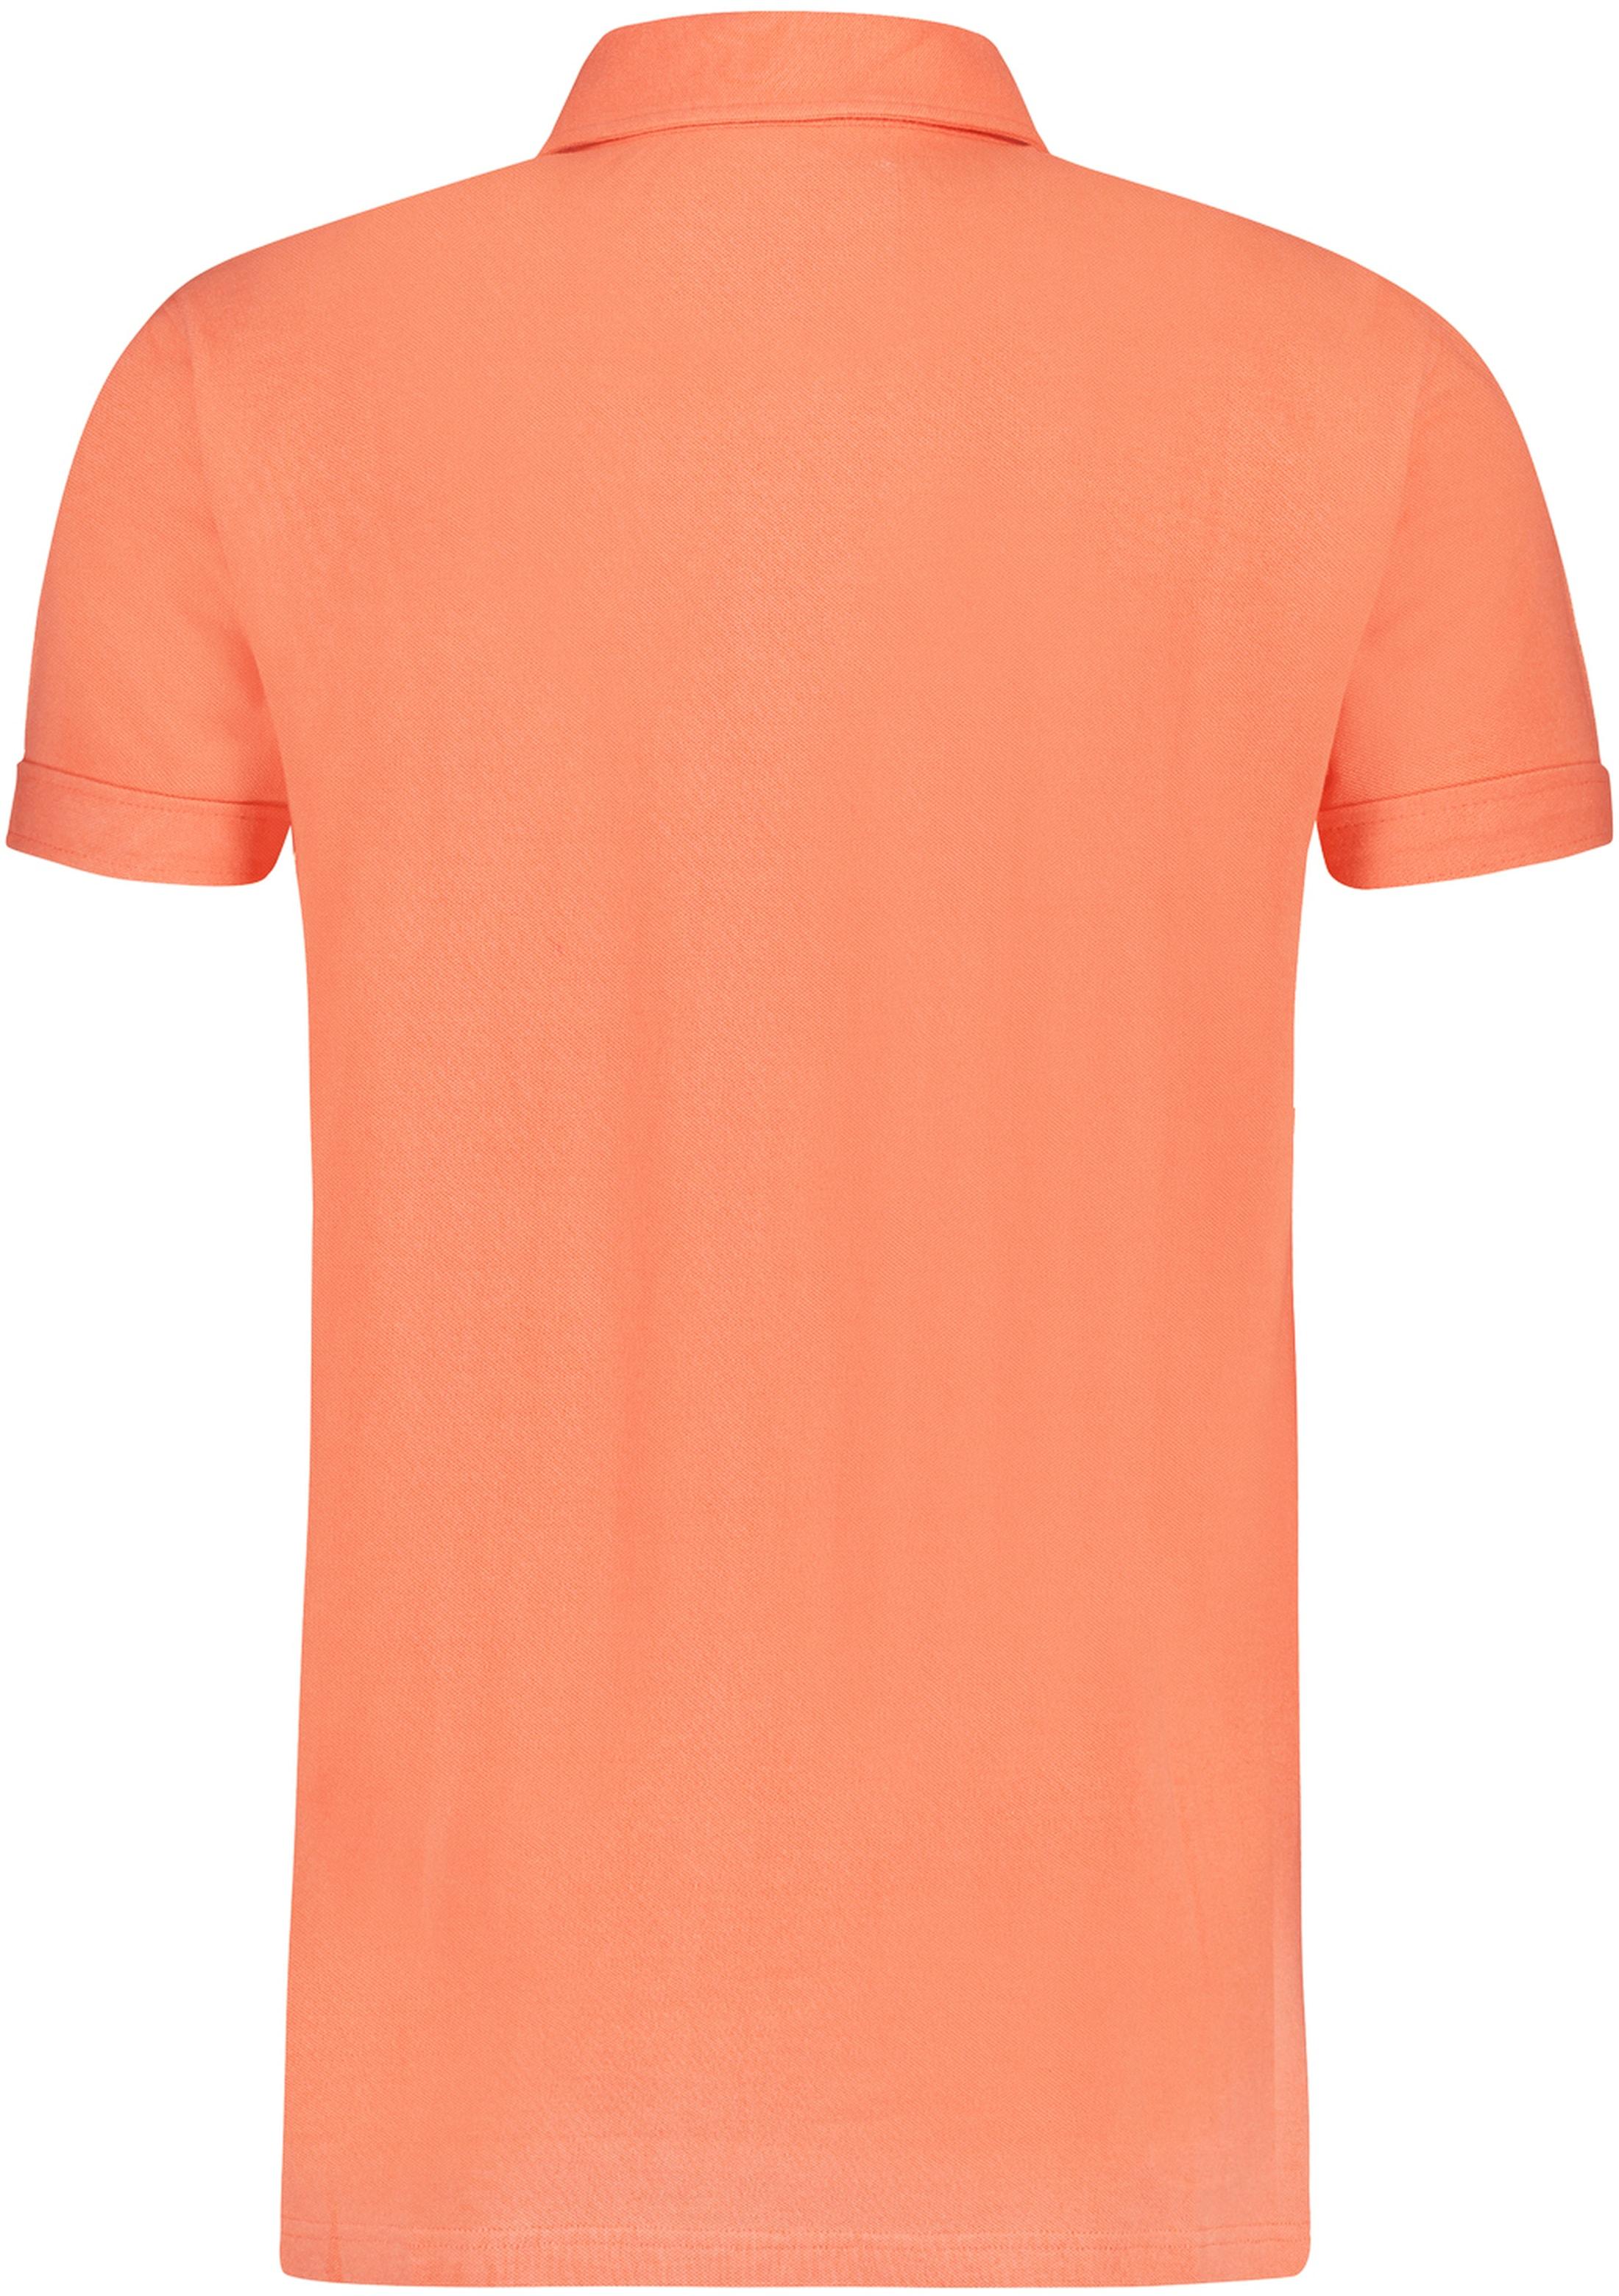 Shiwi Poloshirt Men Neonorange foto 1